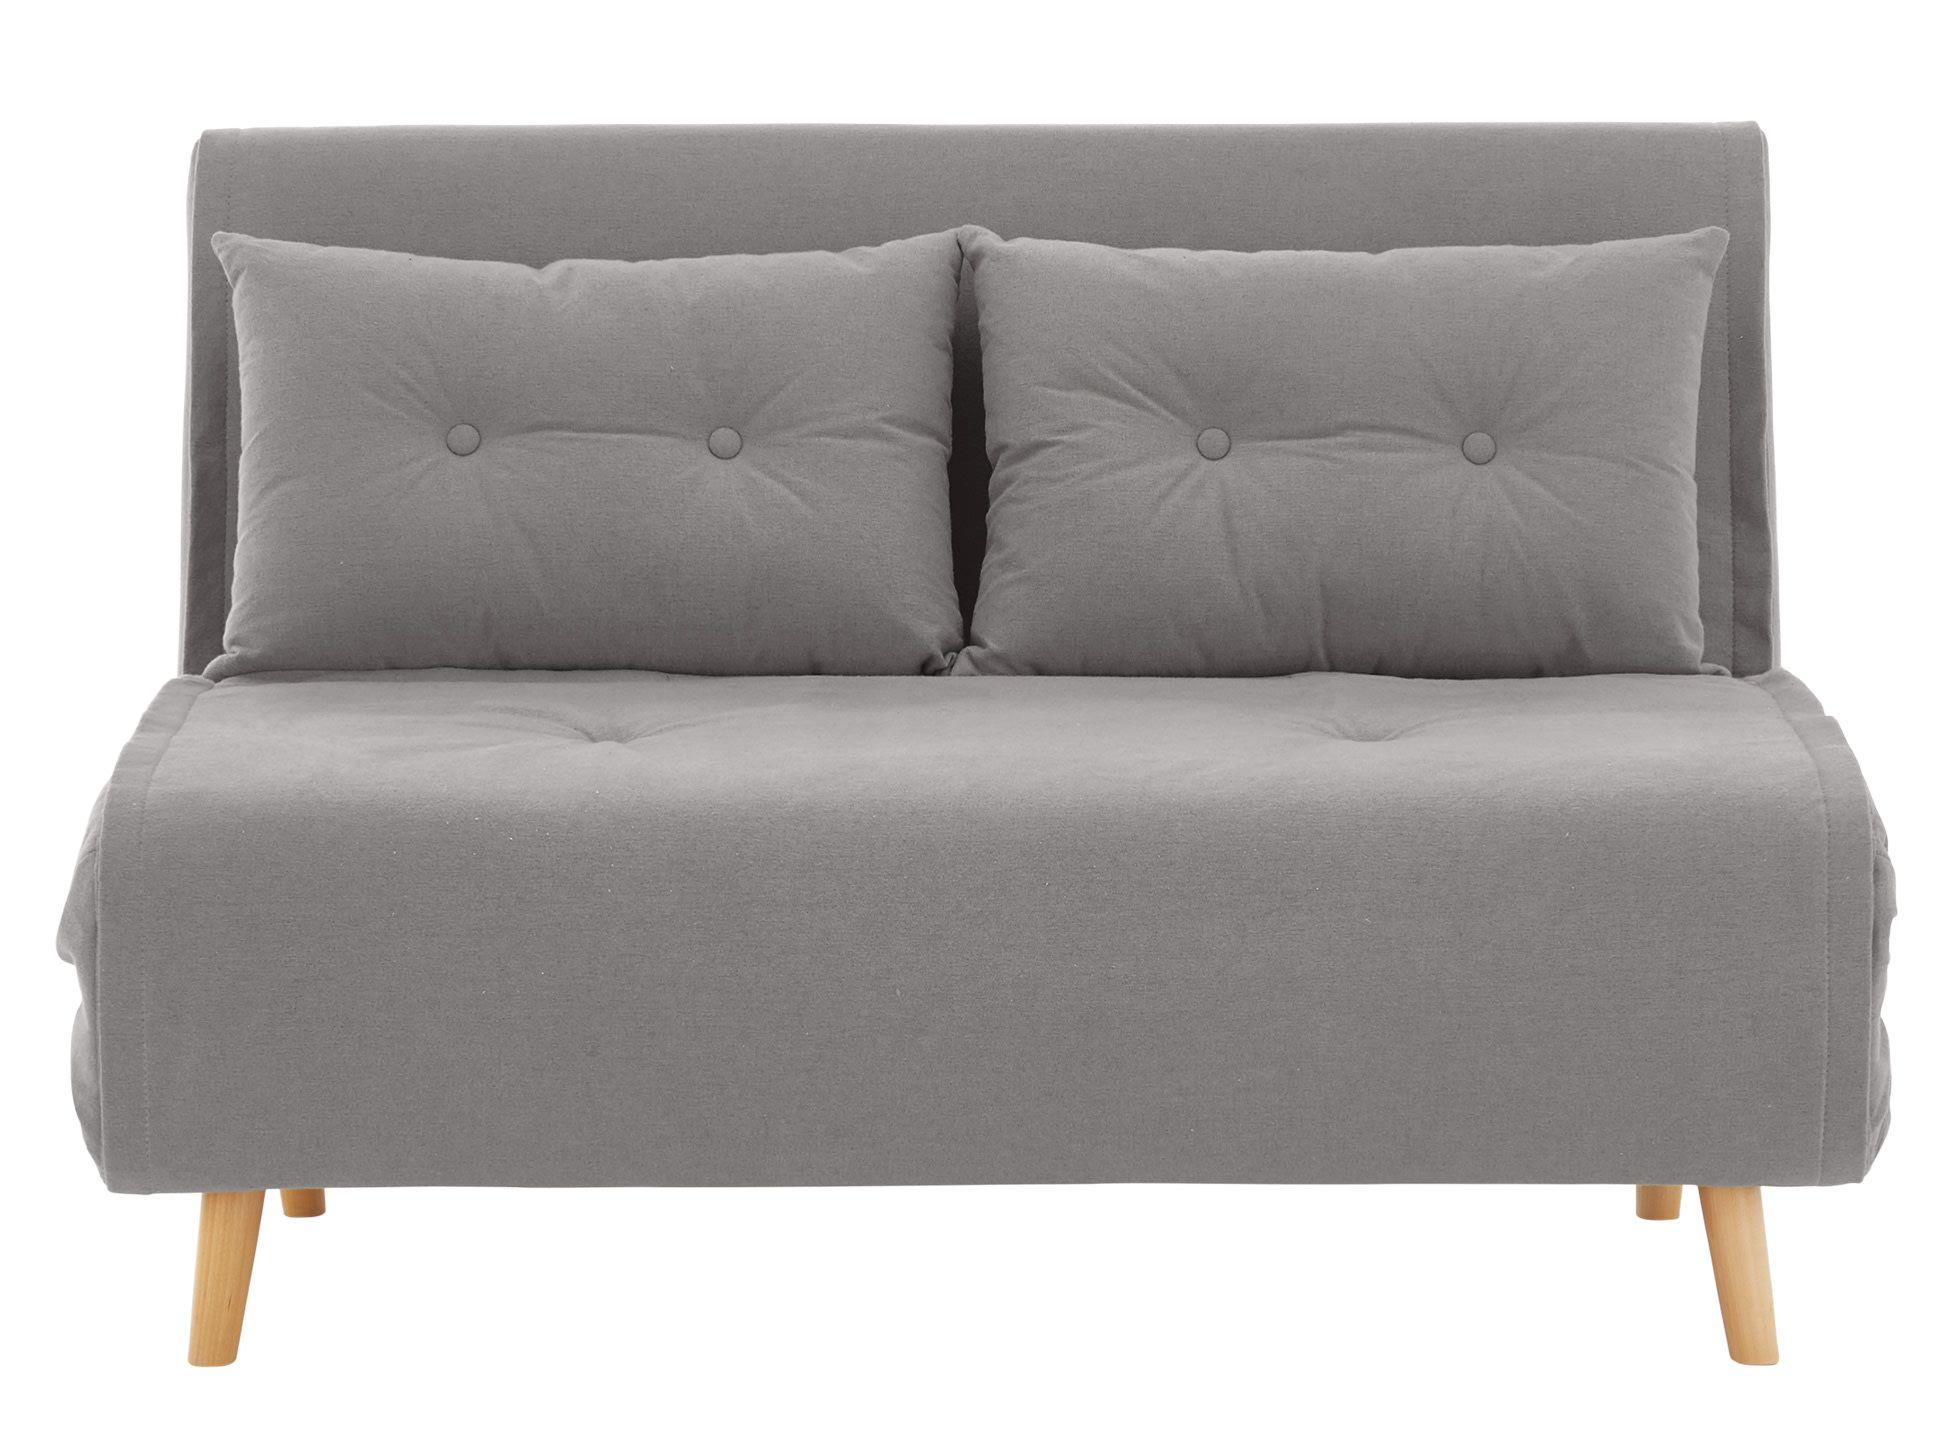 Fantastic Sofa Cama Pequeno Haru En Gris Nube In 2019 Madera Grey Machost Co Dining Chair Design Ideas Machostcouk